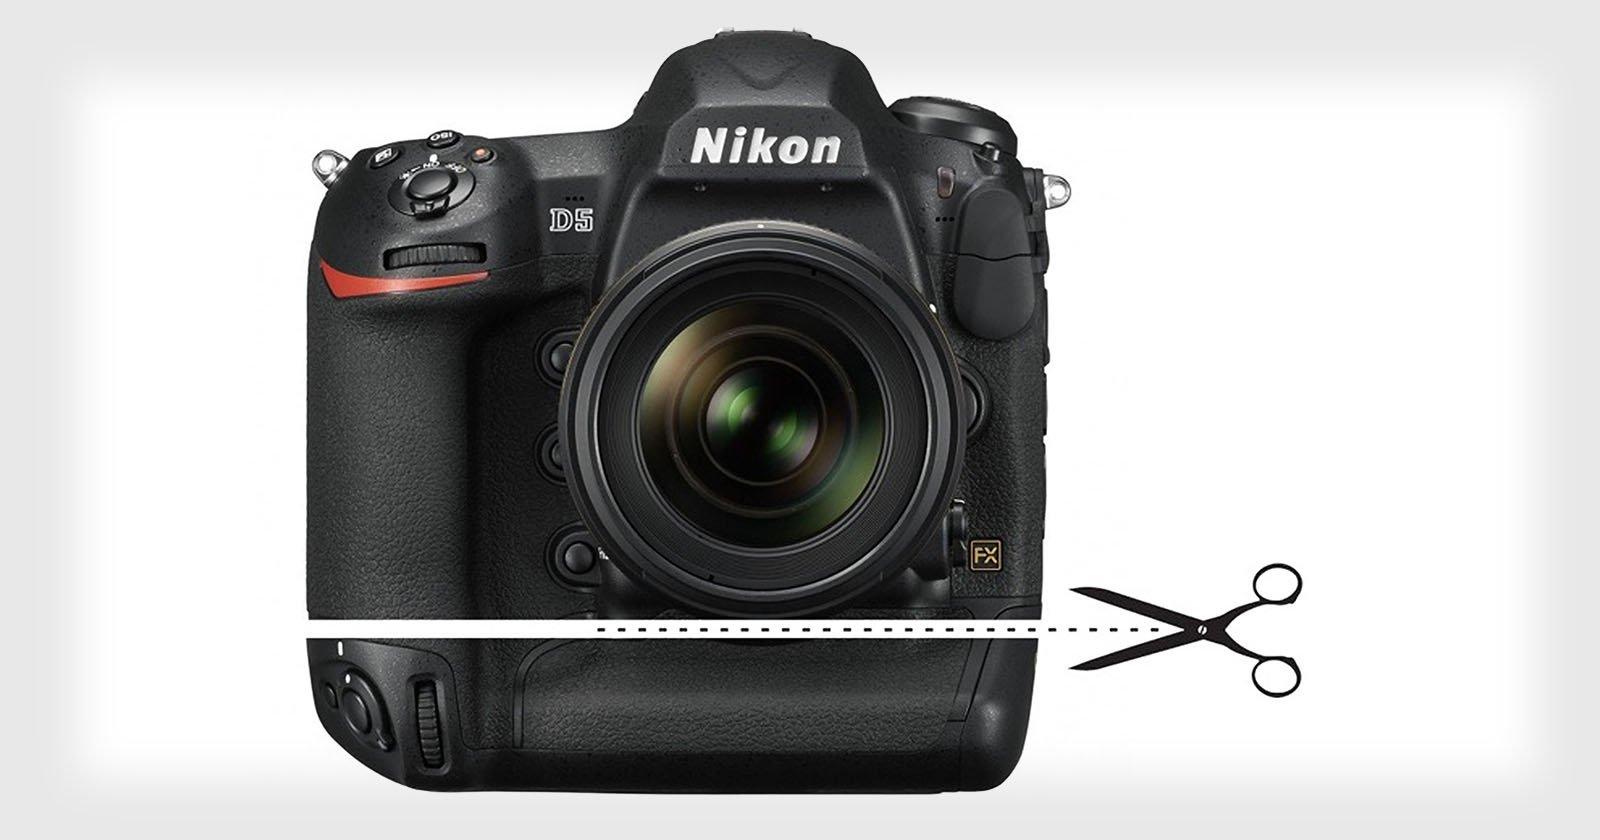 Nikon D850 Will Be a 'Baby Nikon D5', Reports Say